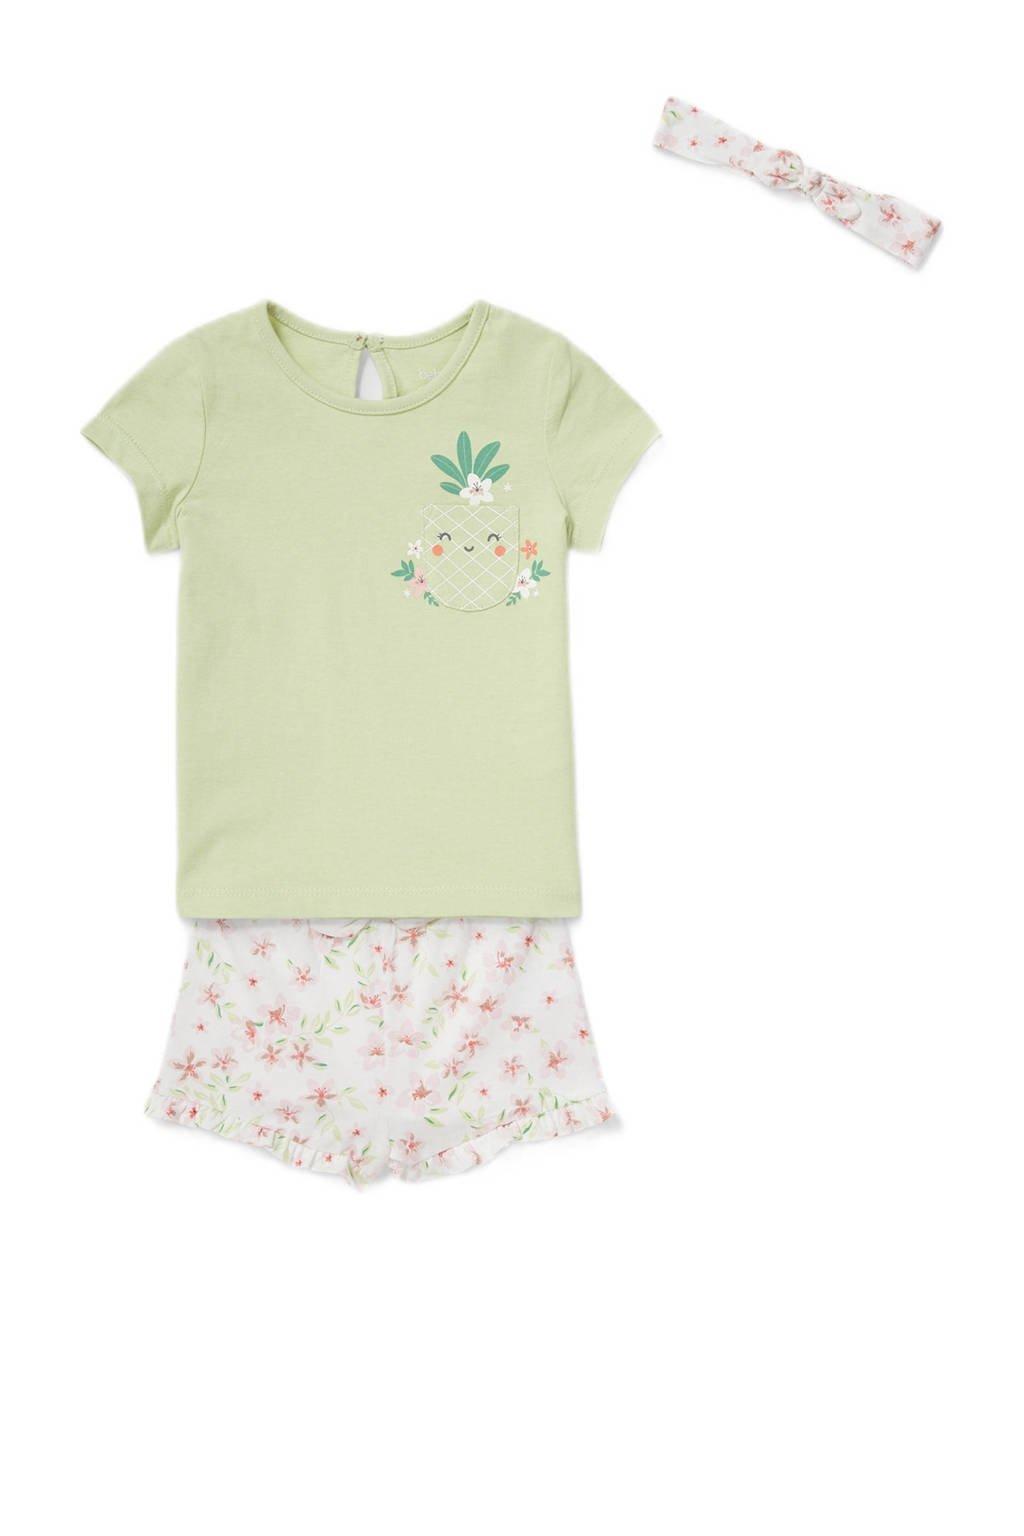 C&A Baby Club   T-shirt + short en bijpassende haarband lichtgroen/wit, Groen